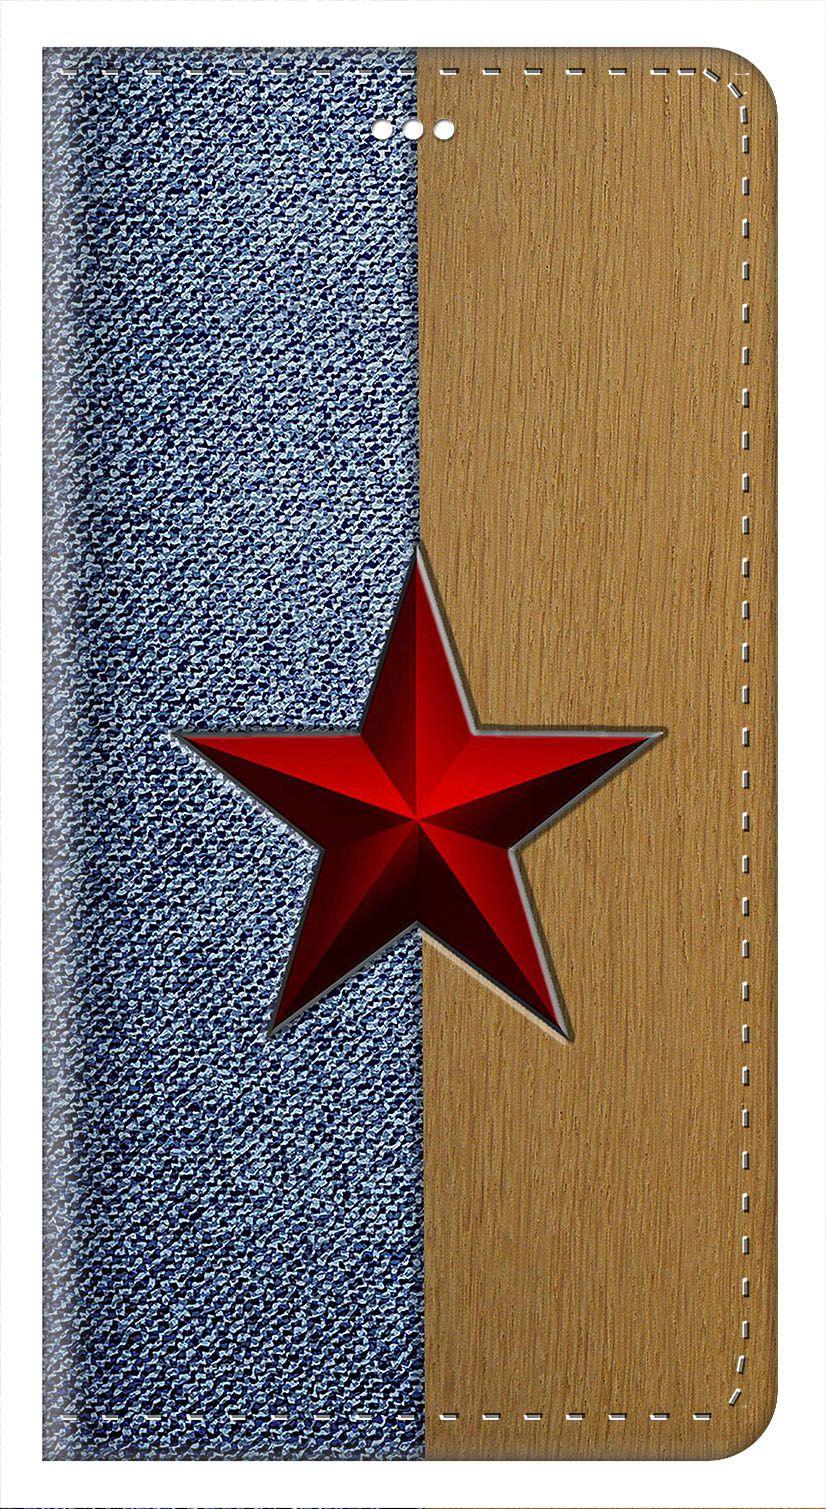 Huawei P20 Lite Flip Cover by ZAPCASE - Multi